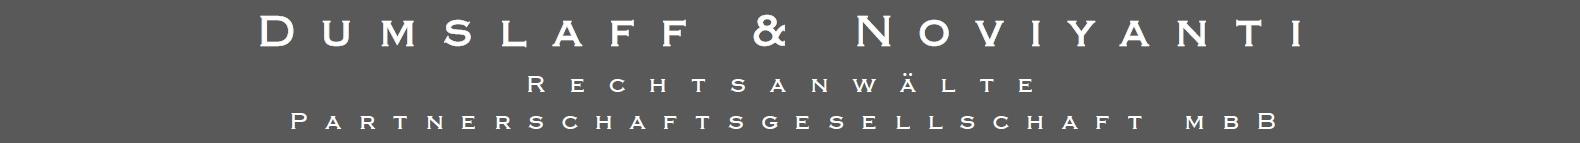 DUMSLAFF & NOVIYANTI RECHTSANWÄLTE Logo